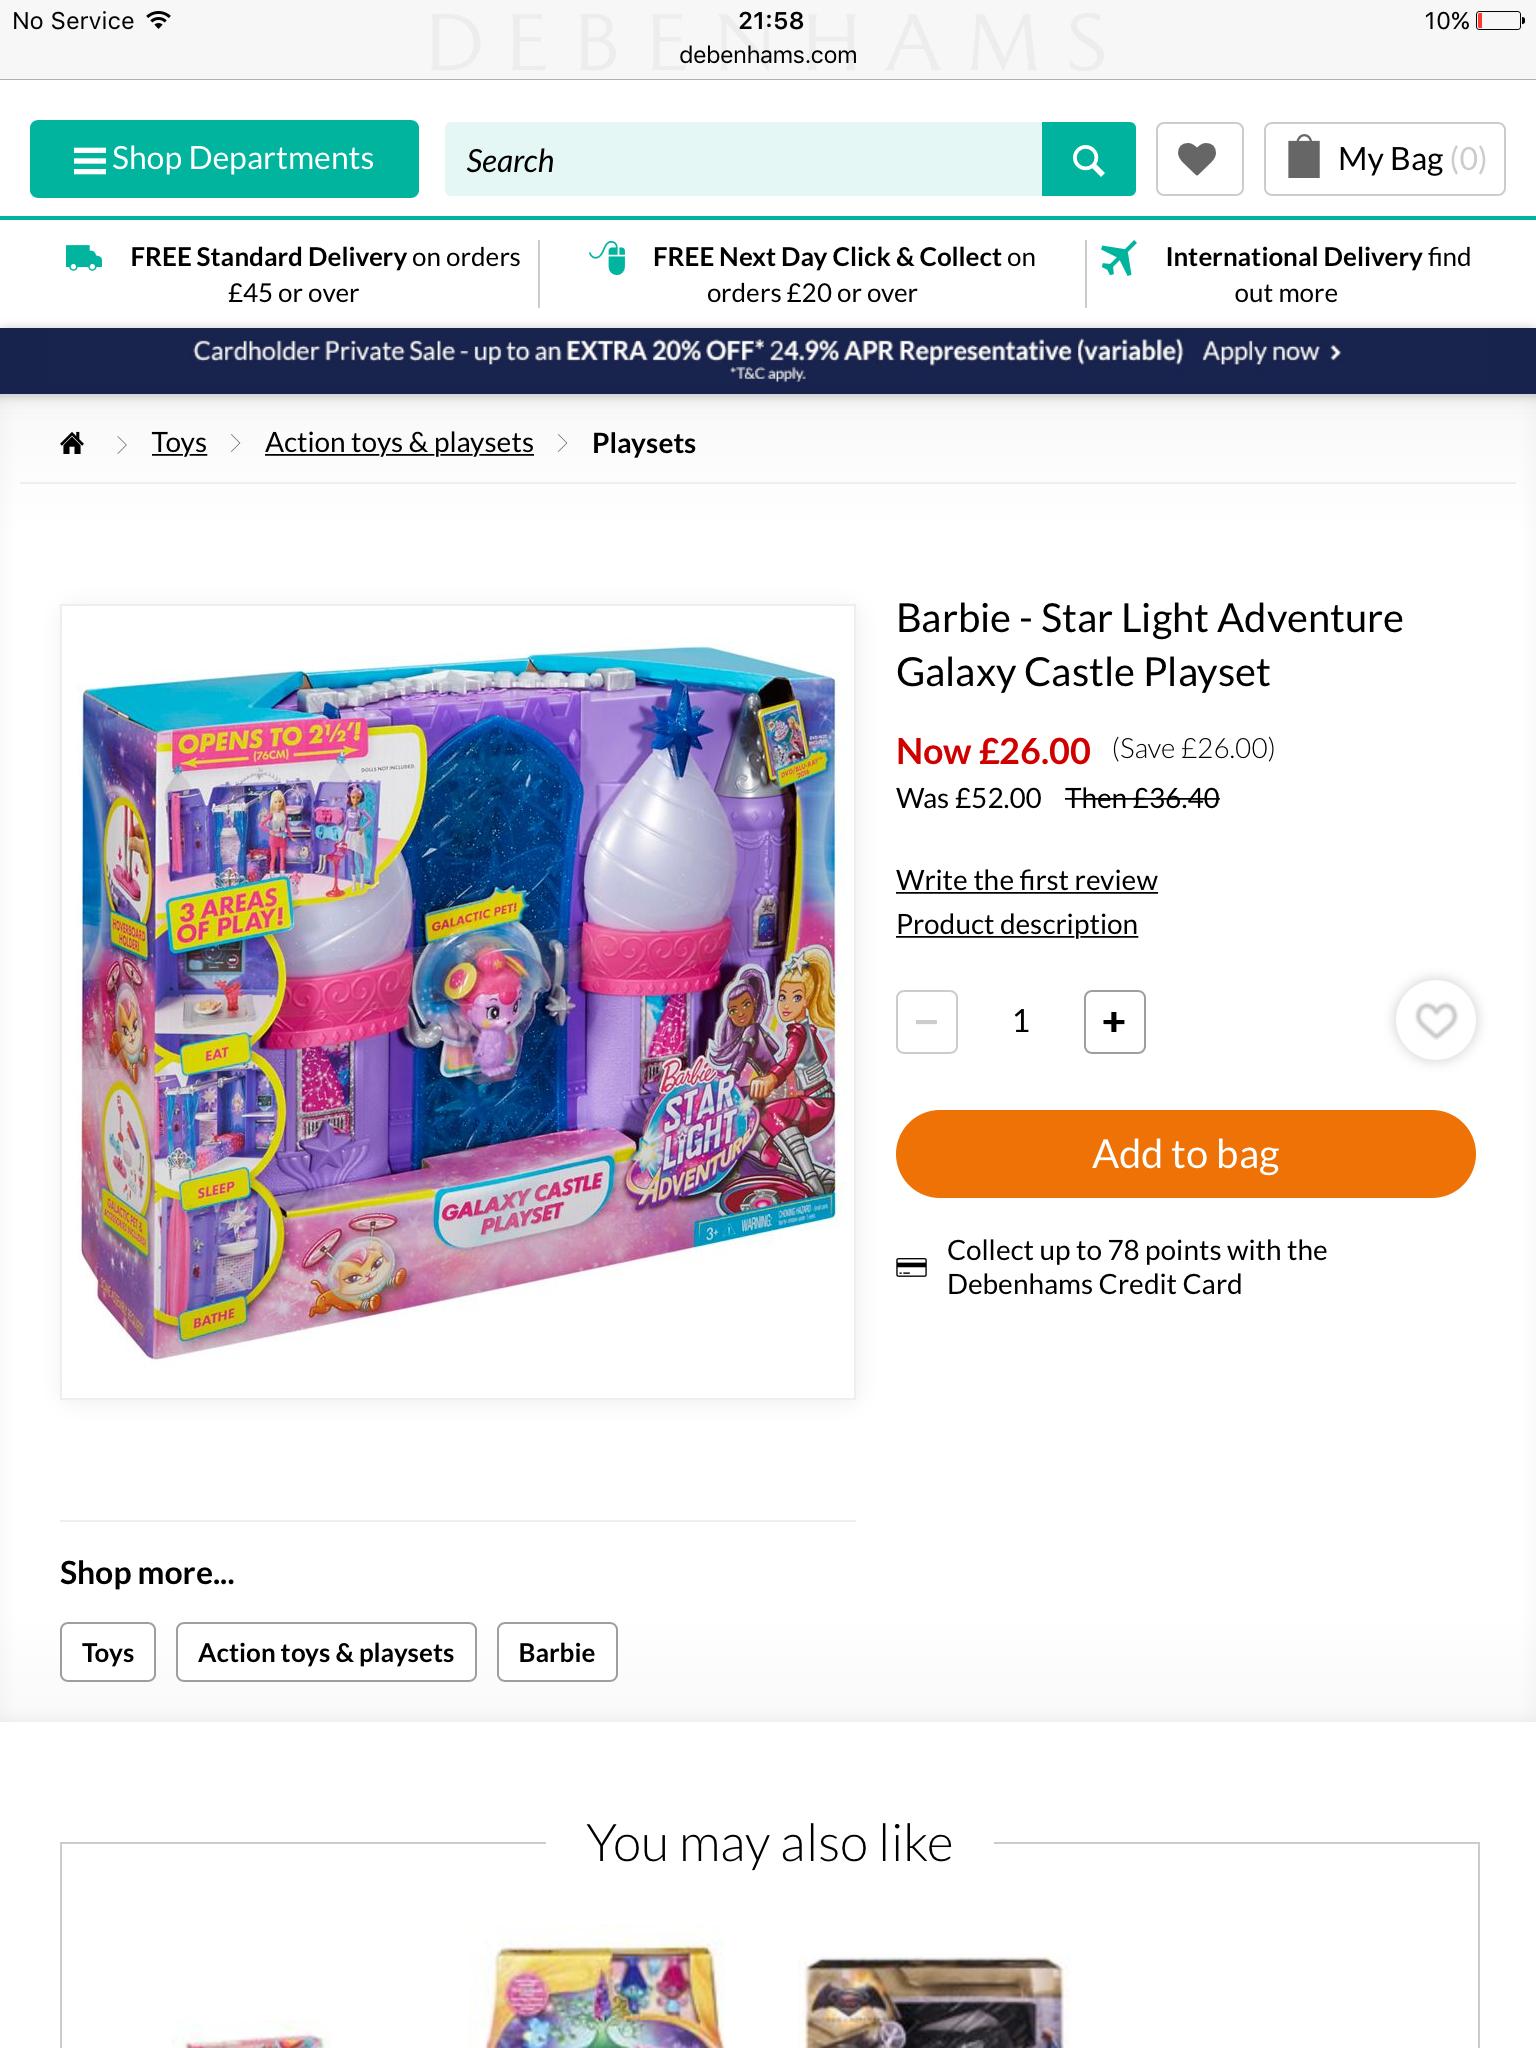 Barbie starlight Adventure Galaxy castle playset £26 @ Debenhams - Free c&c